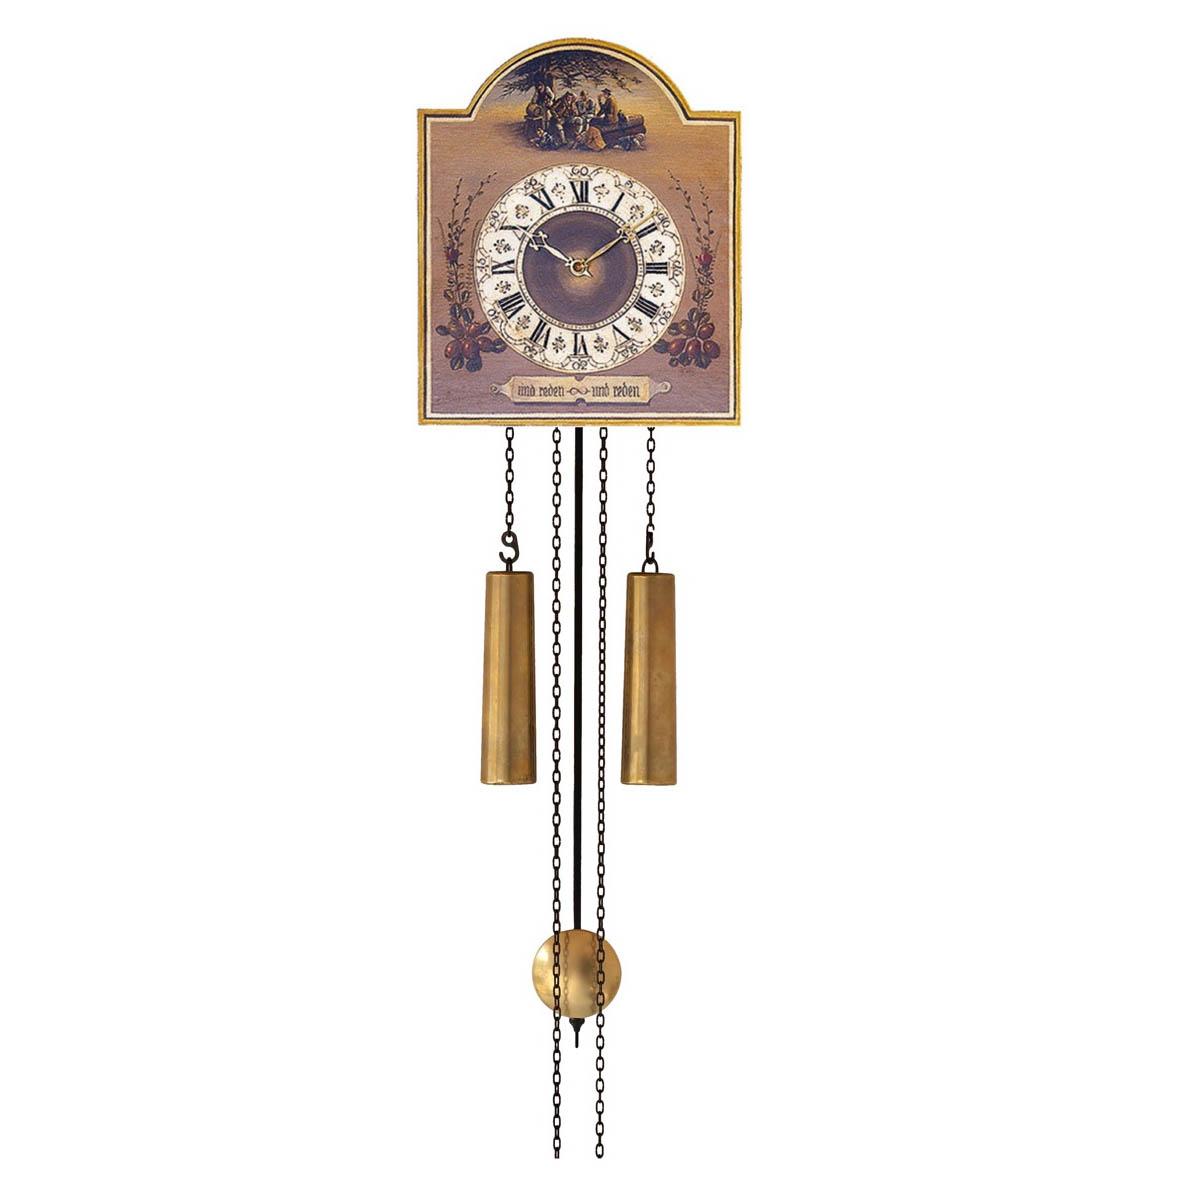 WU74 Traditional Wall Clock